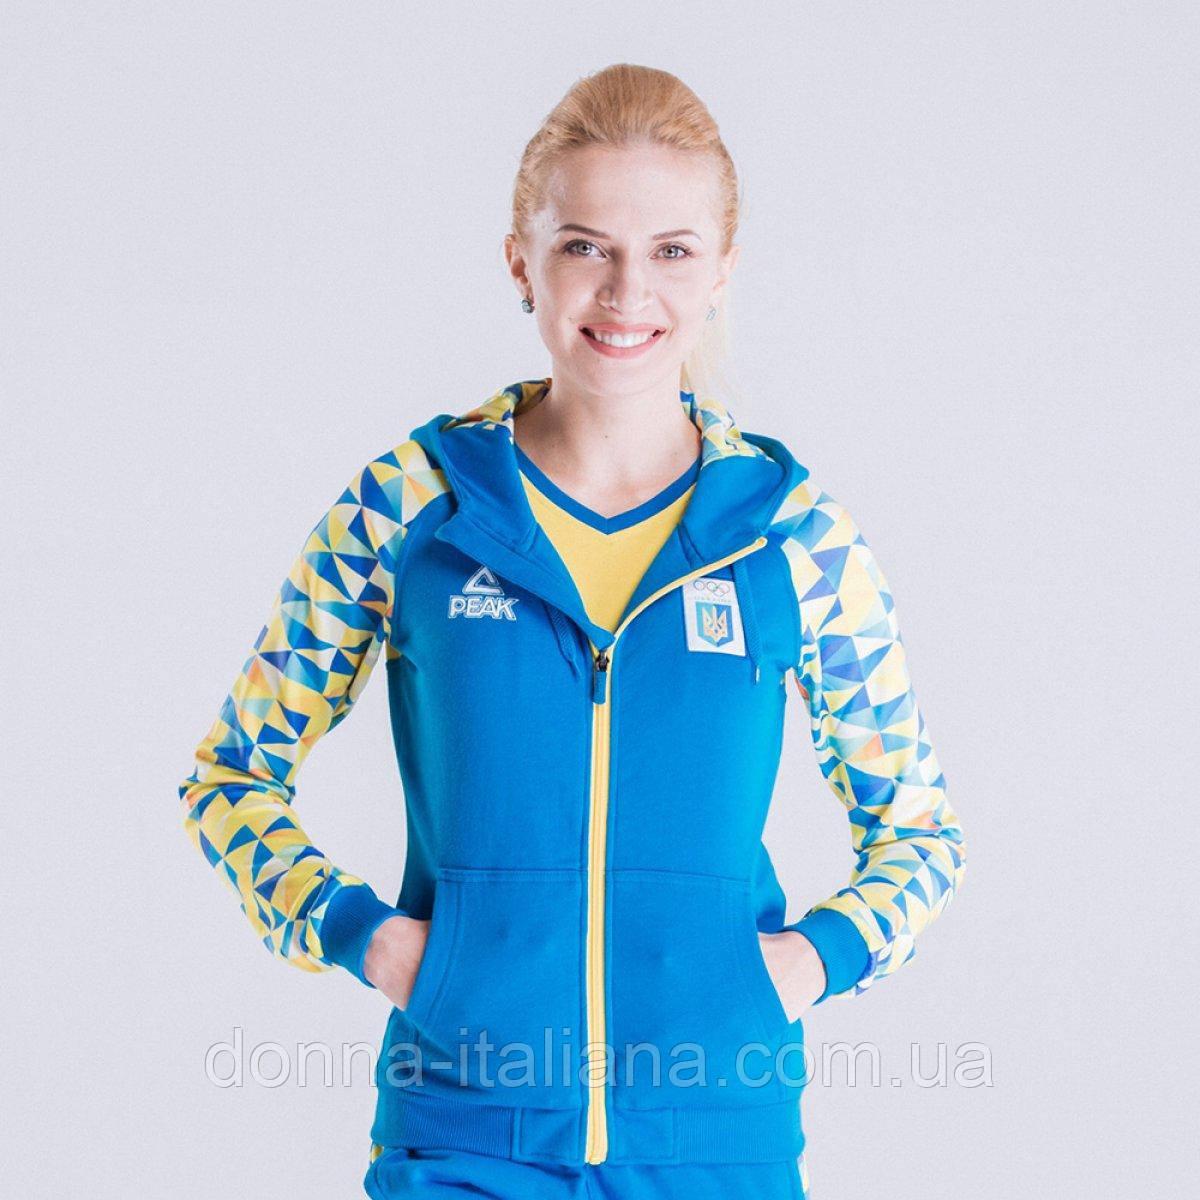 Спортивная кофта Peak Sport FS-UW1607NOK-BLU 3XL Синяя (2000118958017)